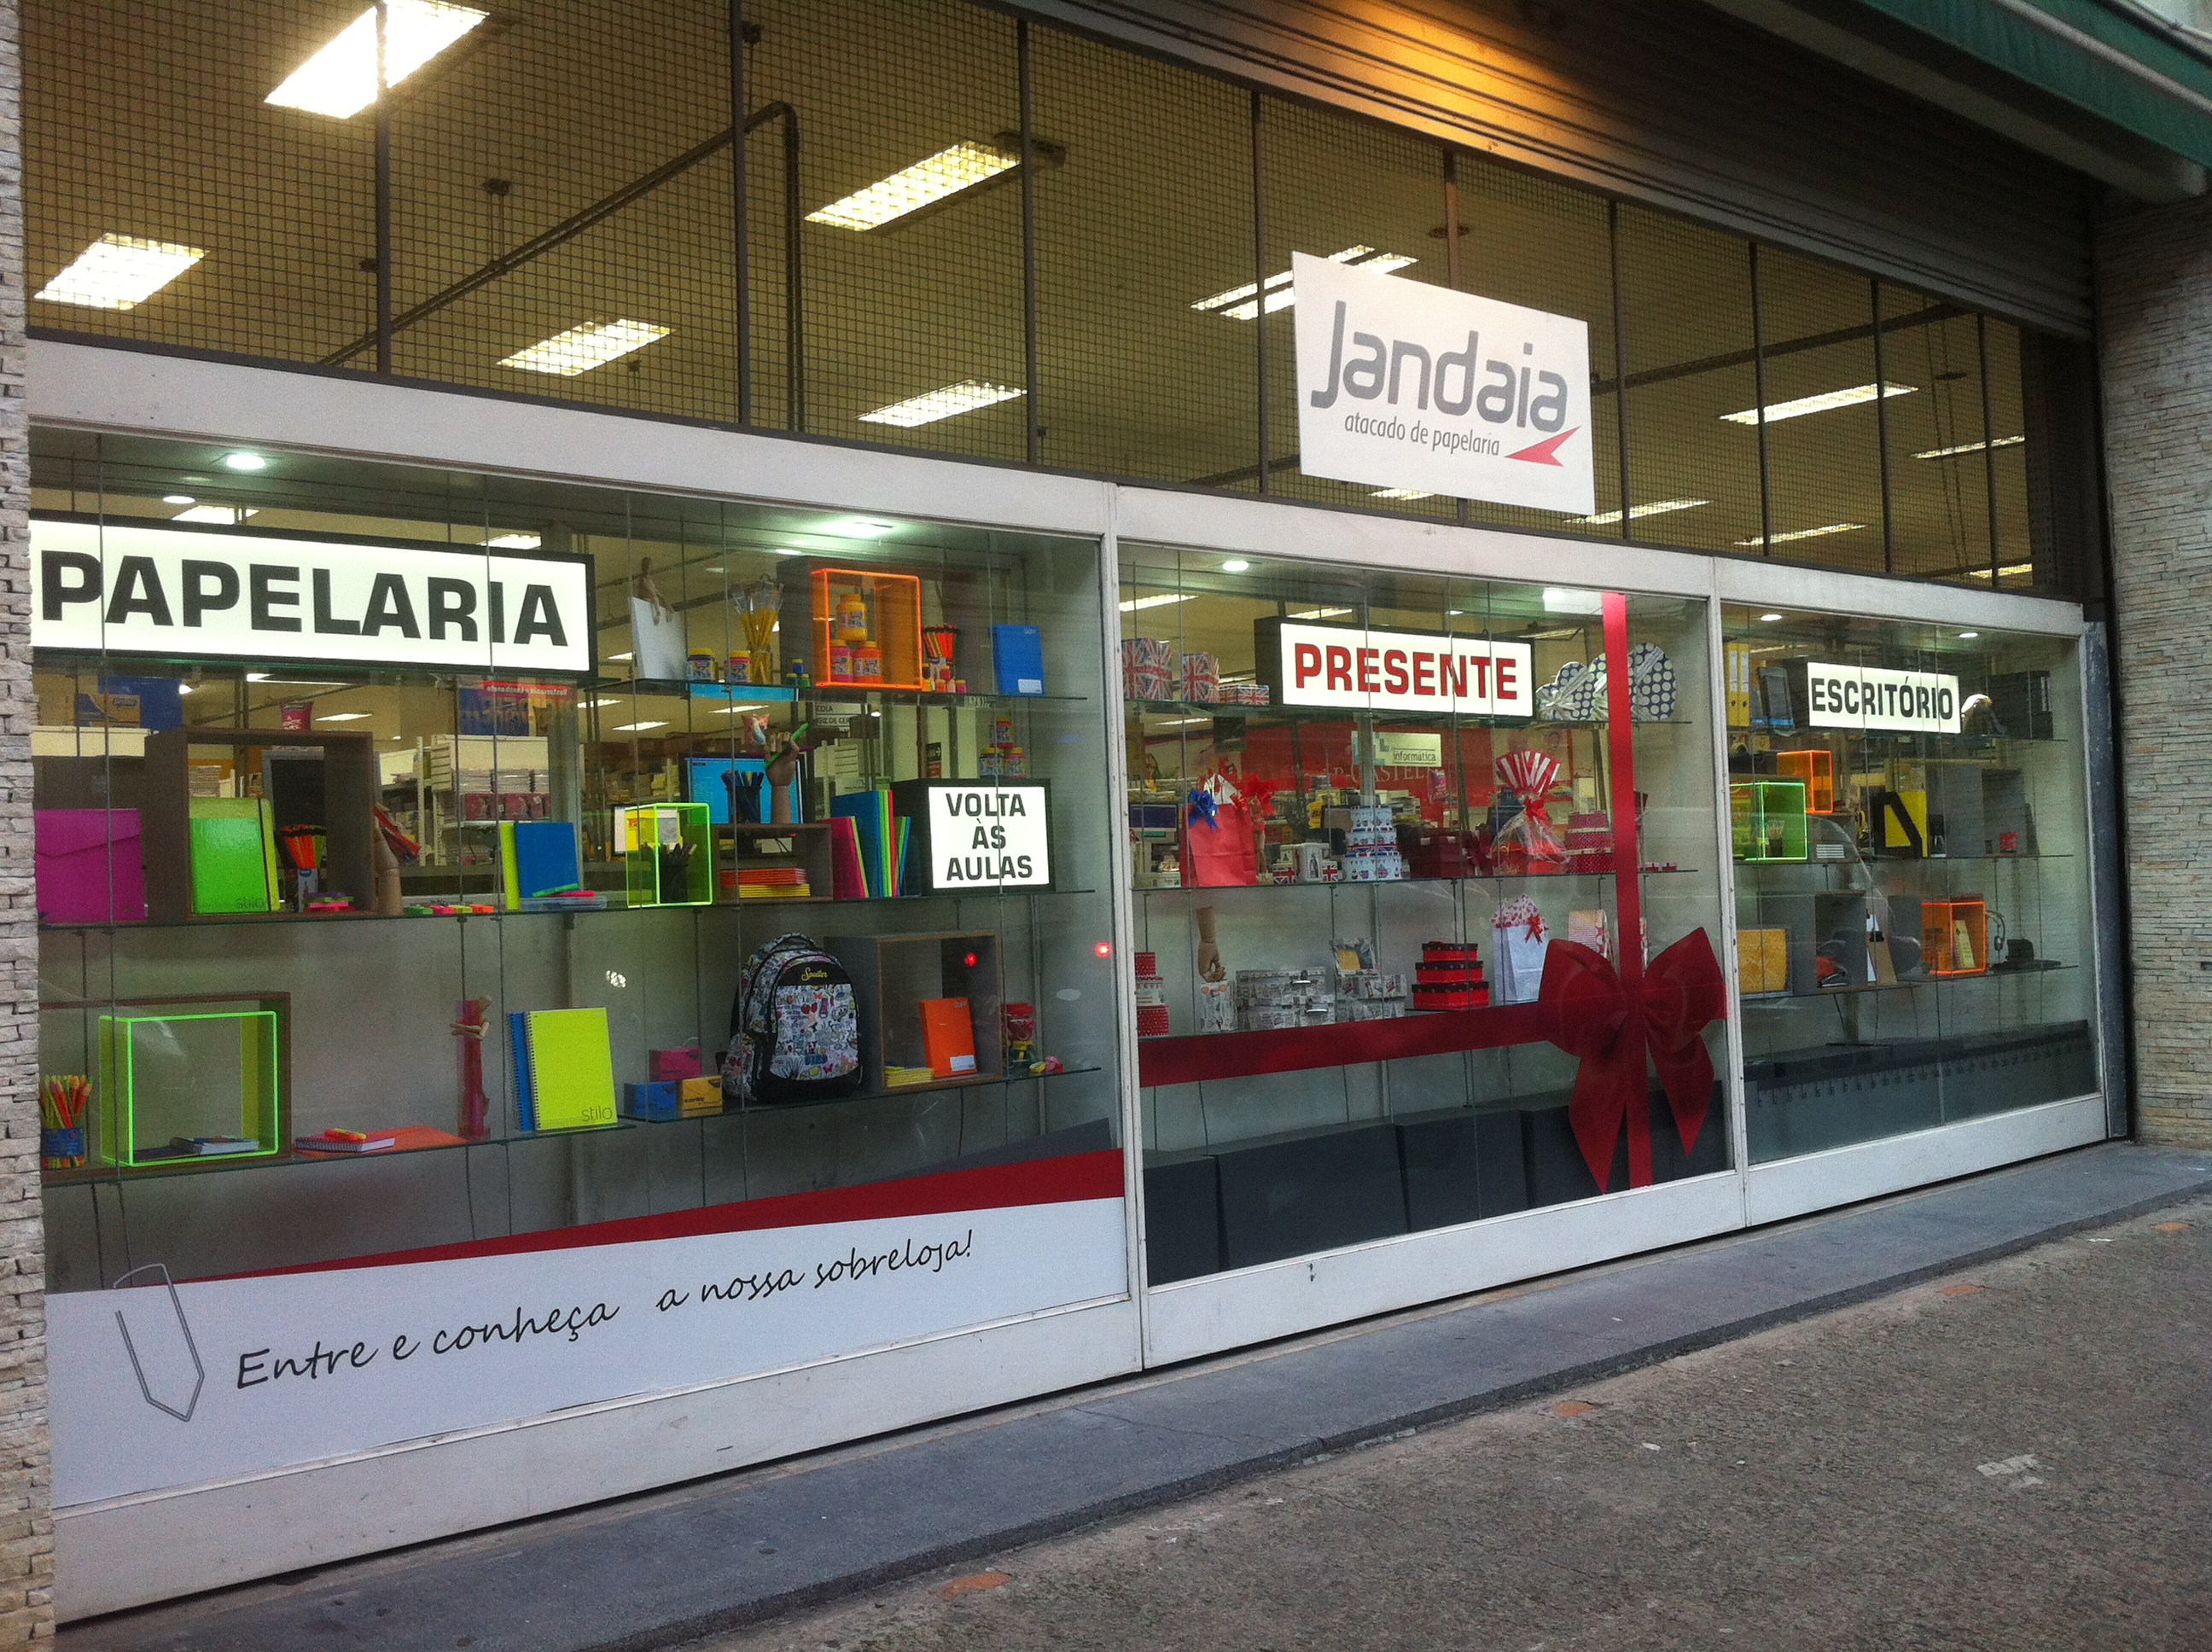 vitrine-jandaia-wvc-5